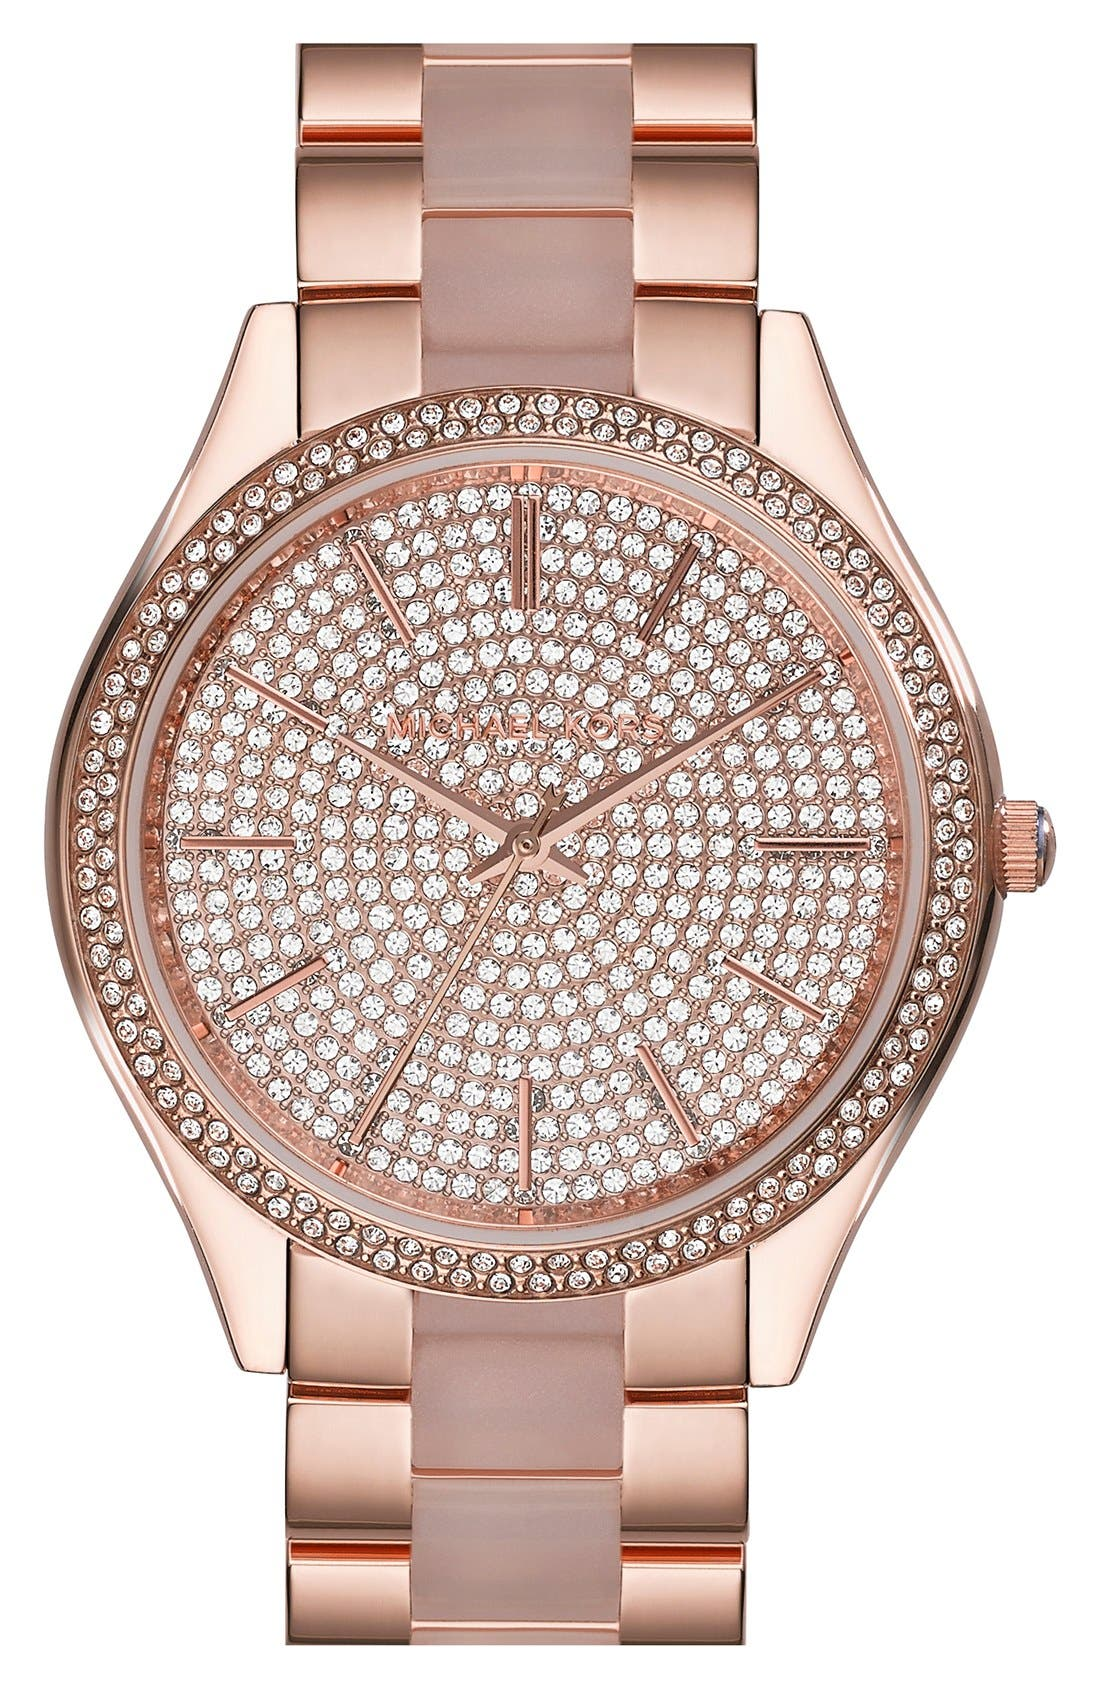 Main Image - Michael Kors 'Slim Runway' Pavé Dial Blush Acetate Link Bracelet Watch, 42mm